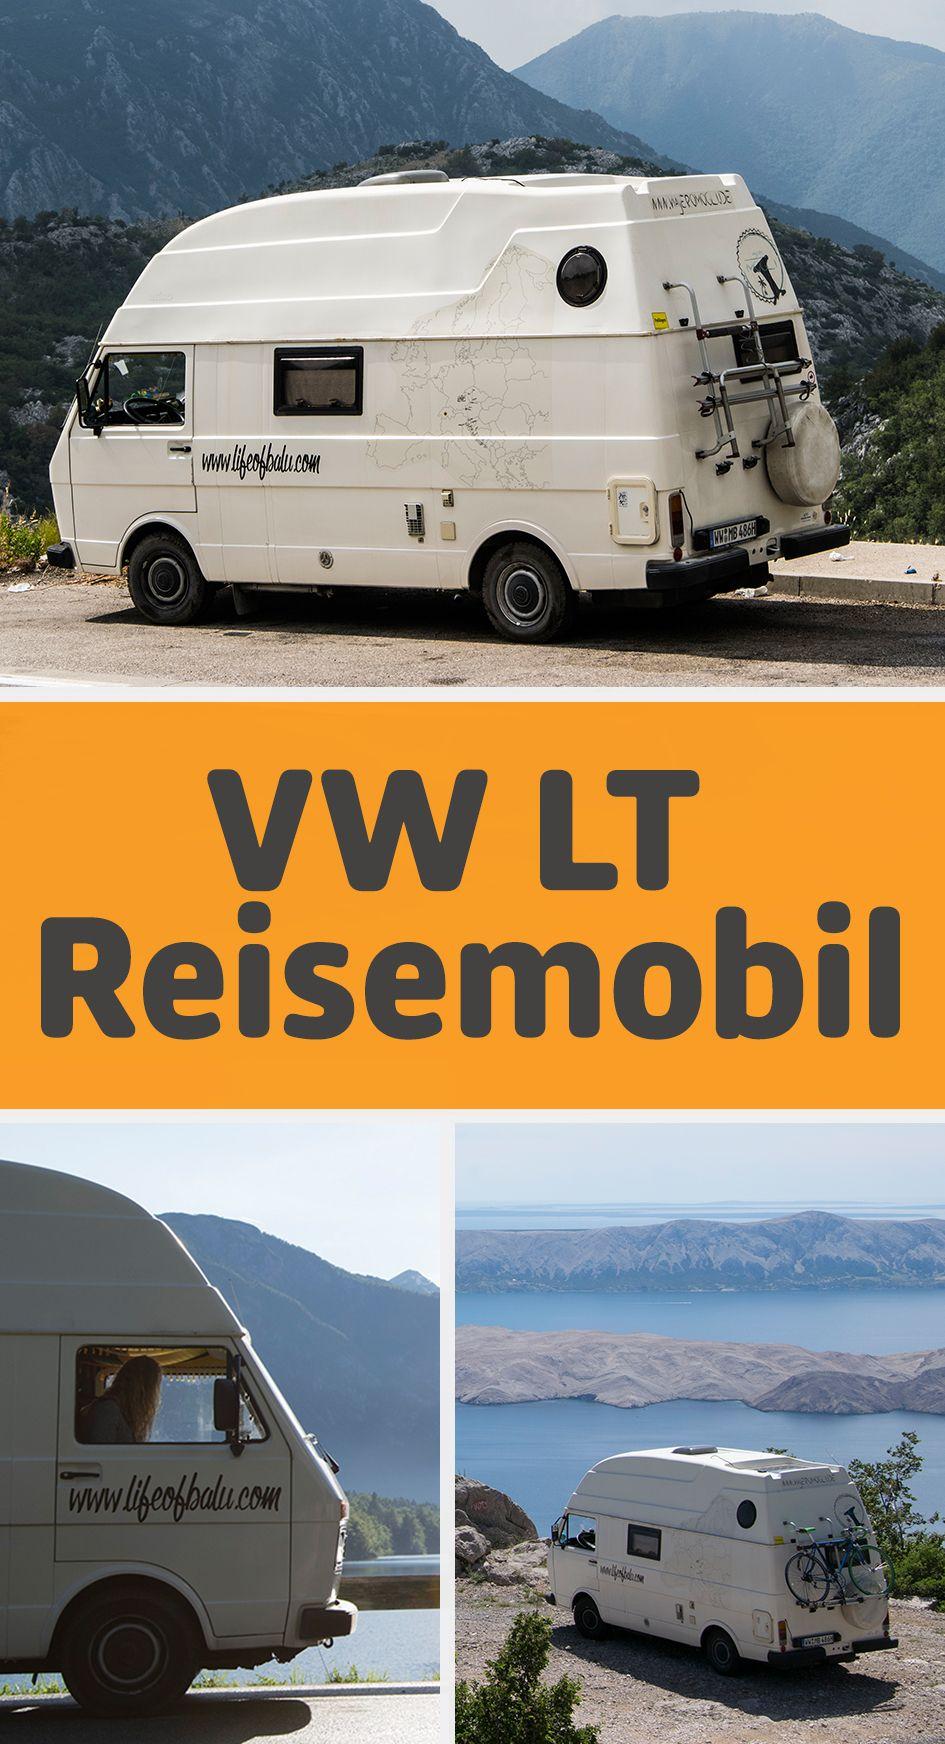 VW LT 8 als Wohnmobil Ausbau  Vw lt, Vw lt 8, Vw lt camper